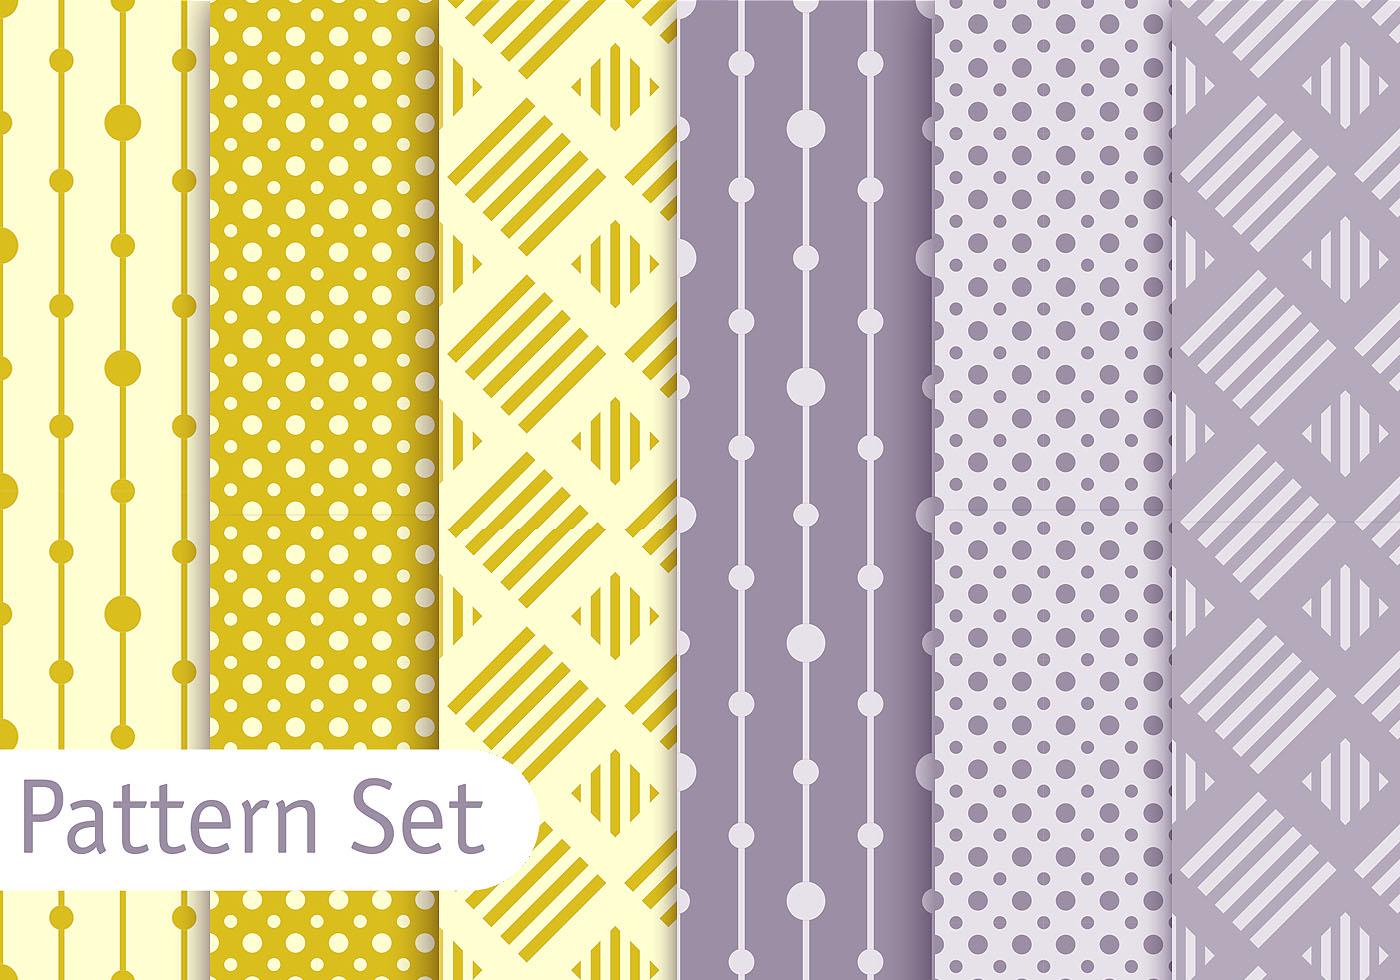 Soft Pastel Geometric Pattern Set Download Free Vector Art Stock Graphics Amp Images